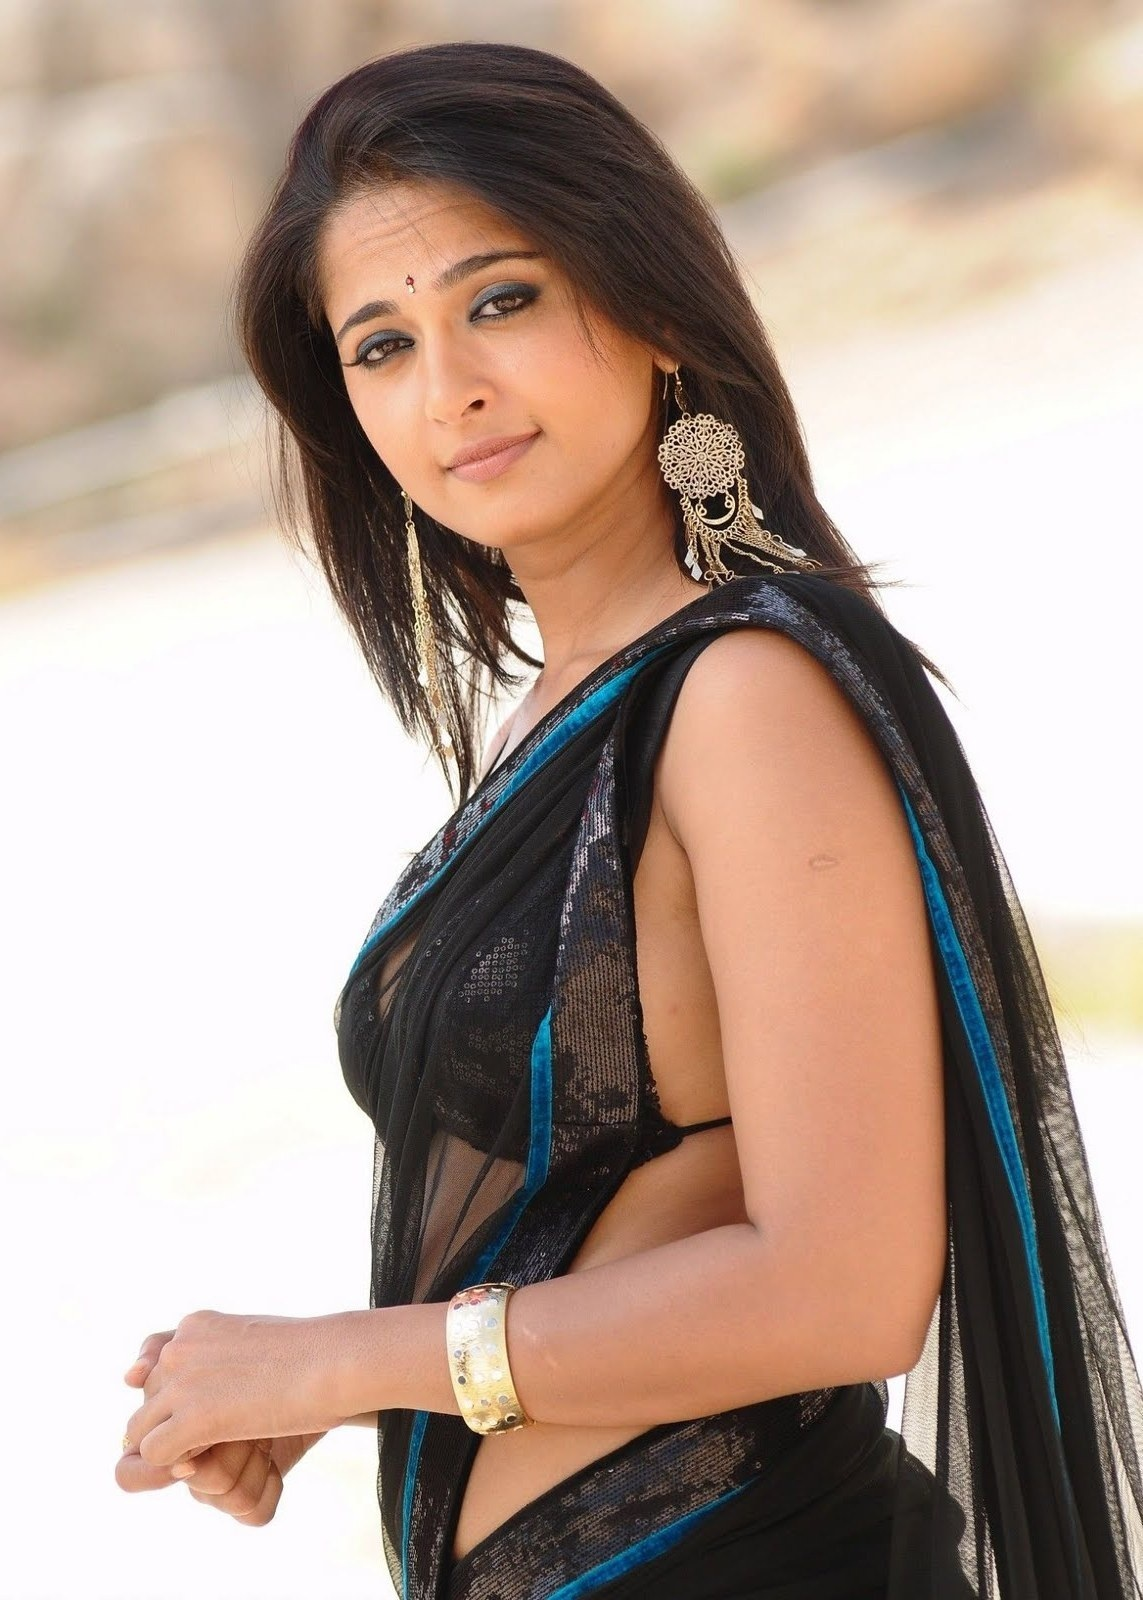 Download Anushka Shetty - Sexy HQ Photo Wallpaper HD FREE Uploaded